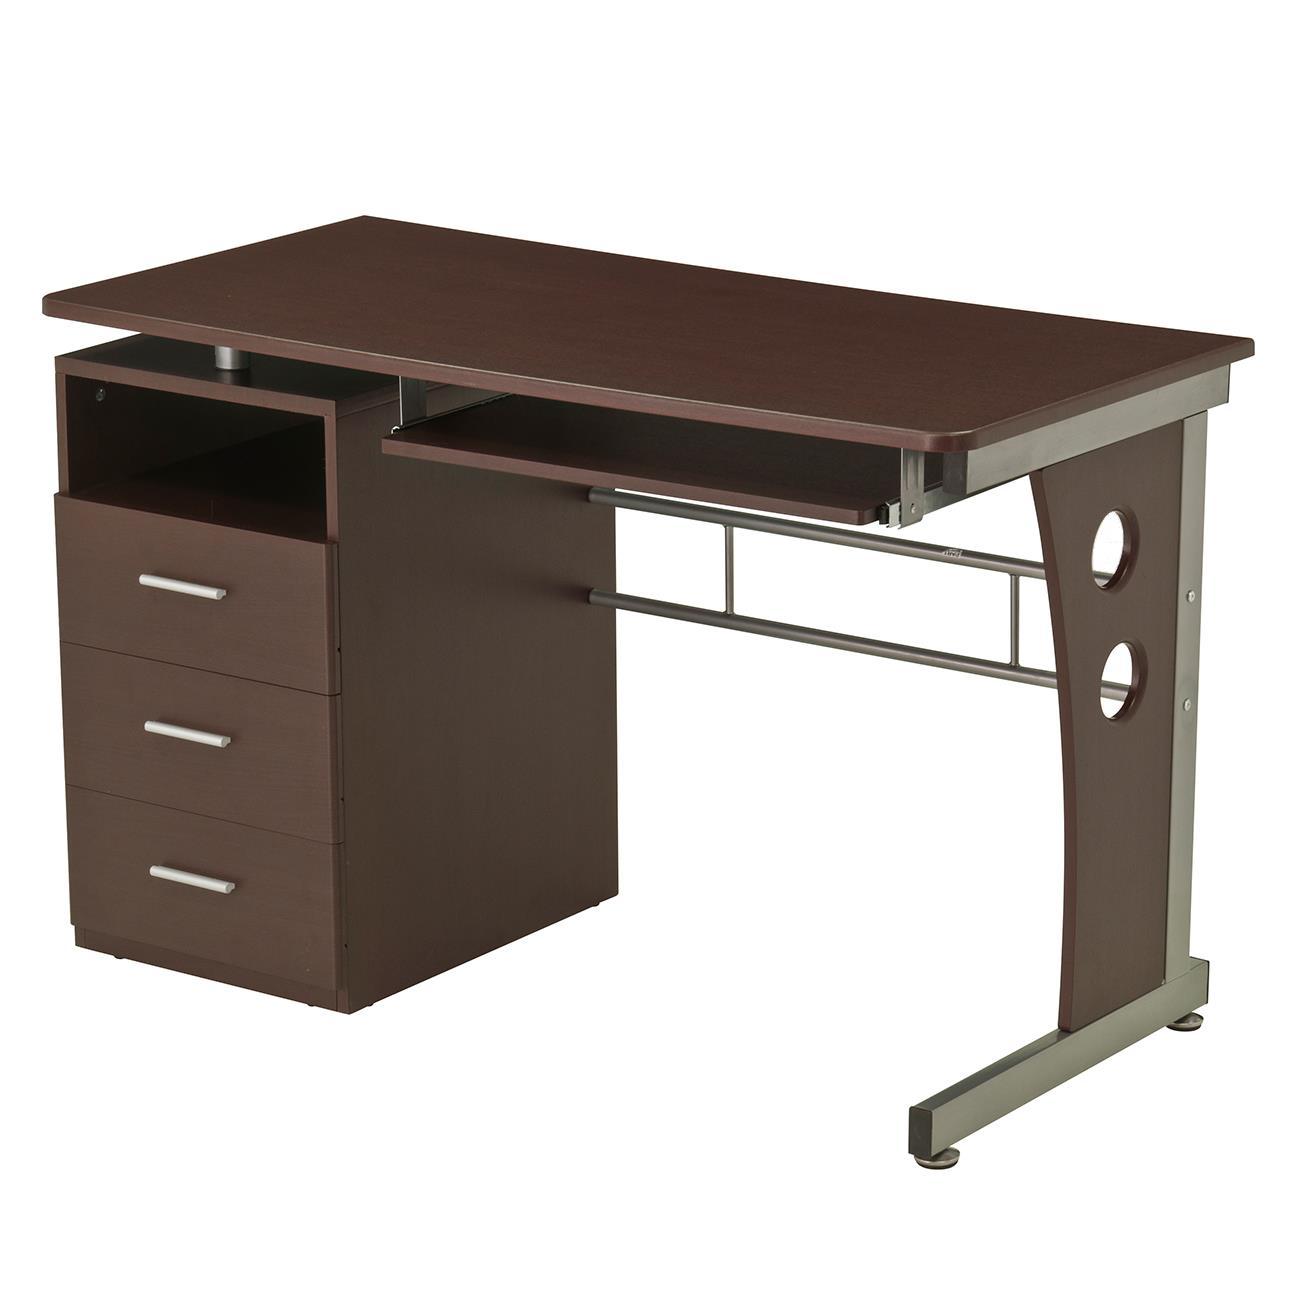 Techni mobili computer desk with ample storage for Mobili computer